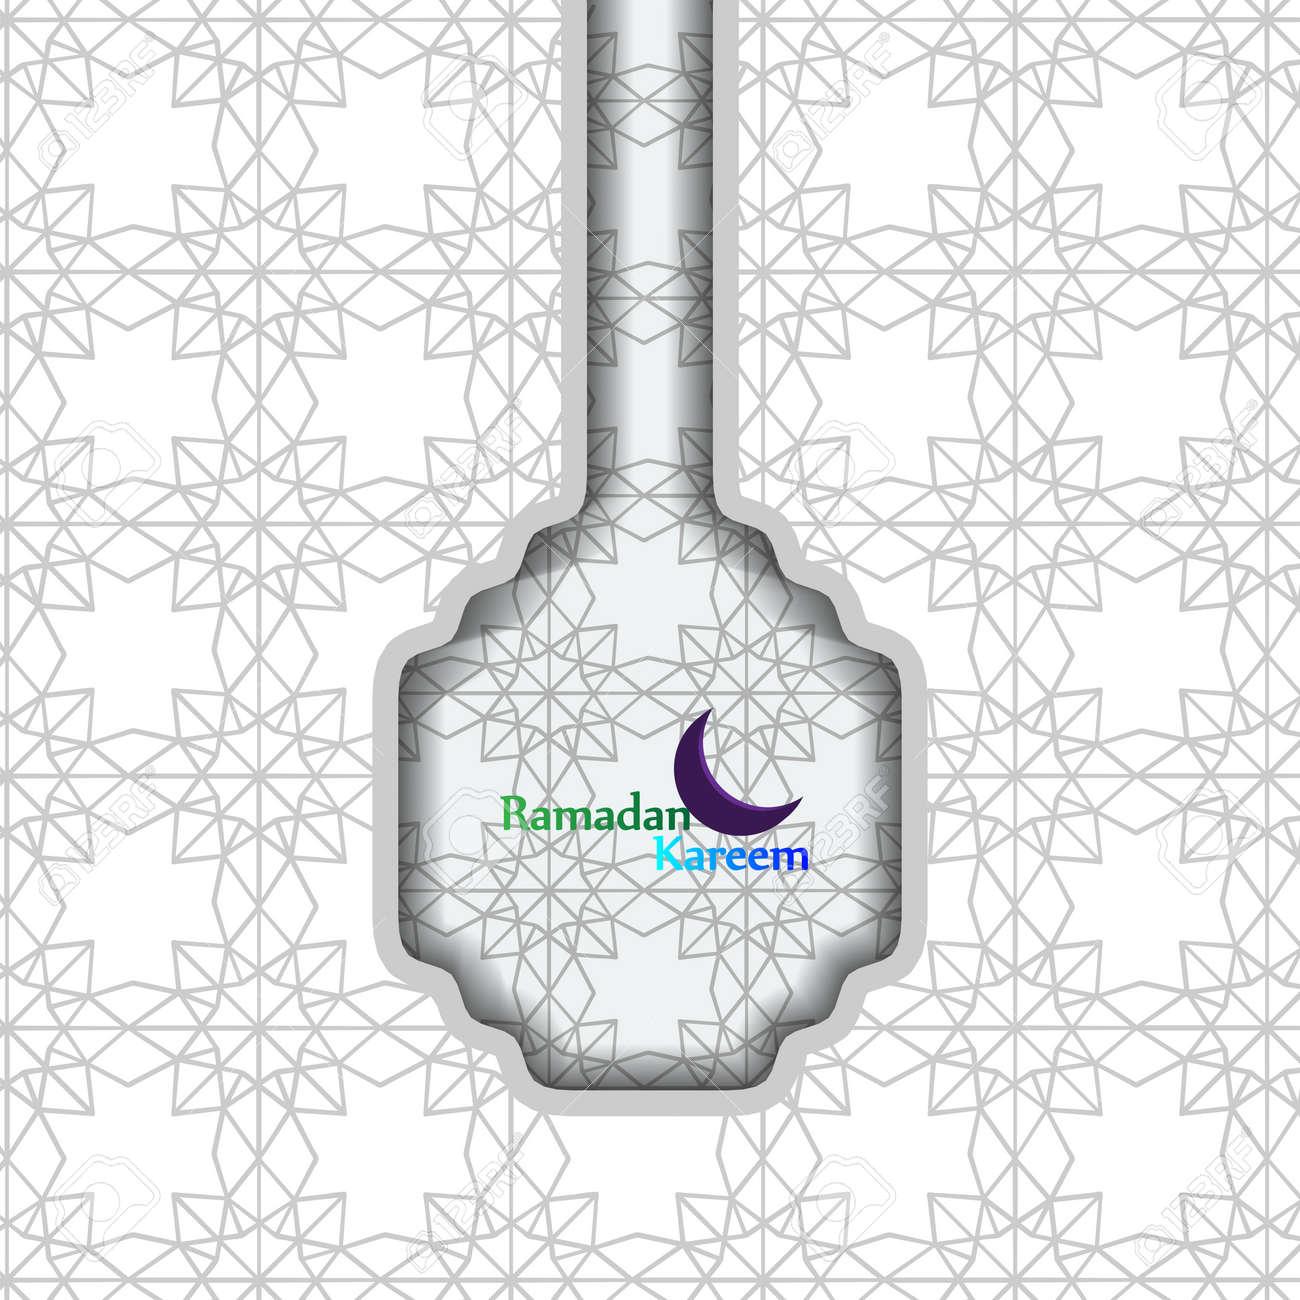 eps10 ramadan karim arabic calligraphy islamic paper banner